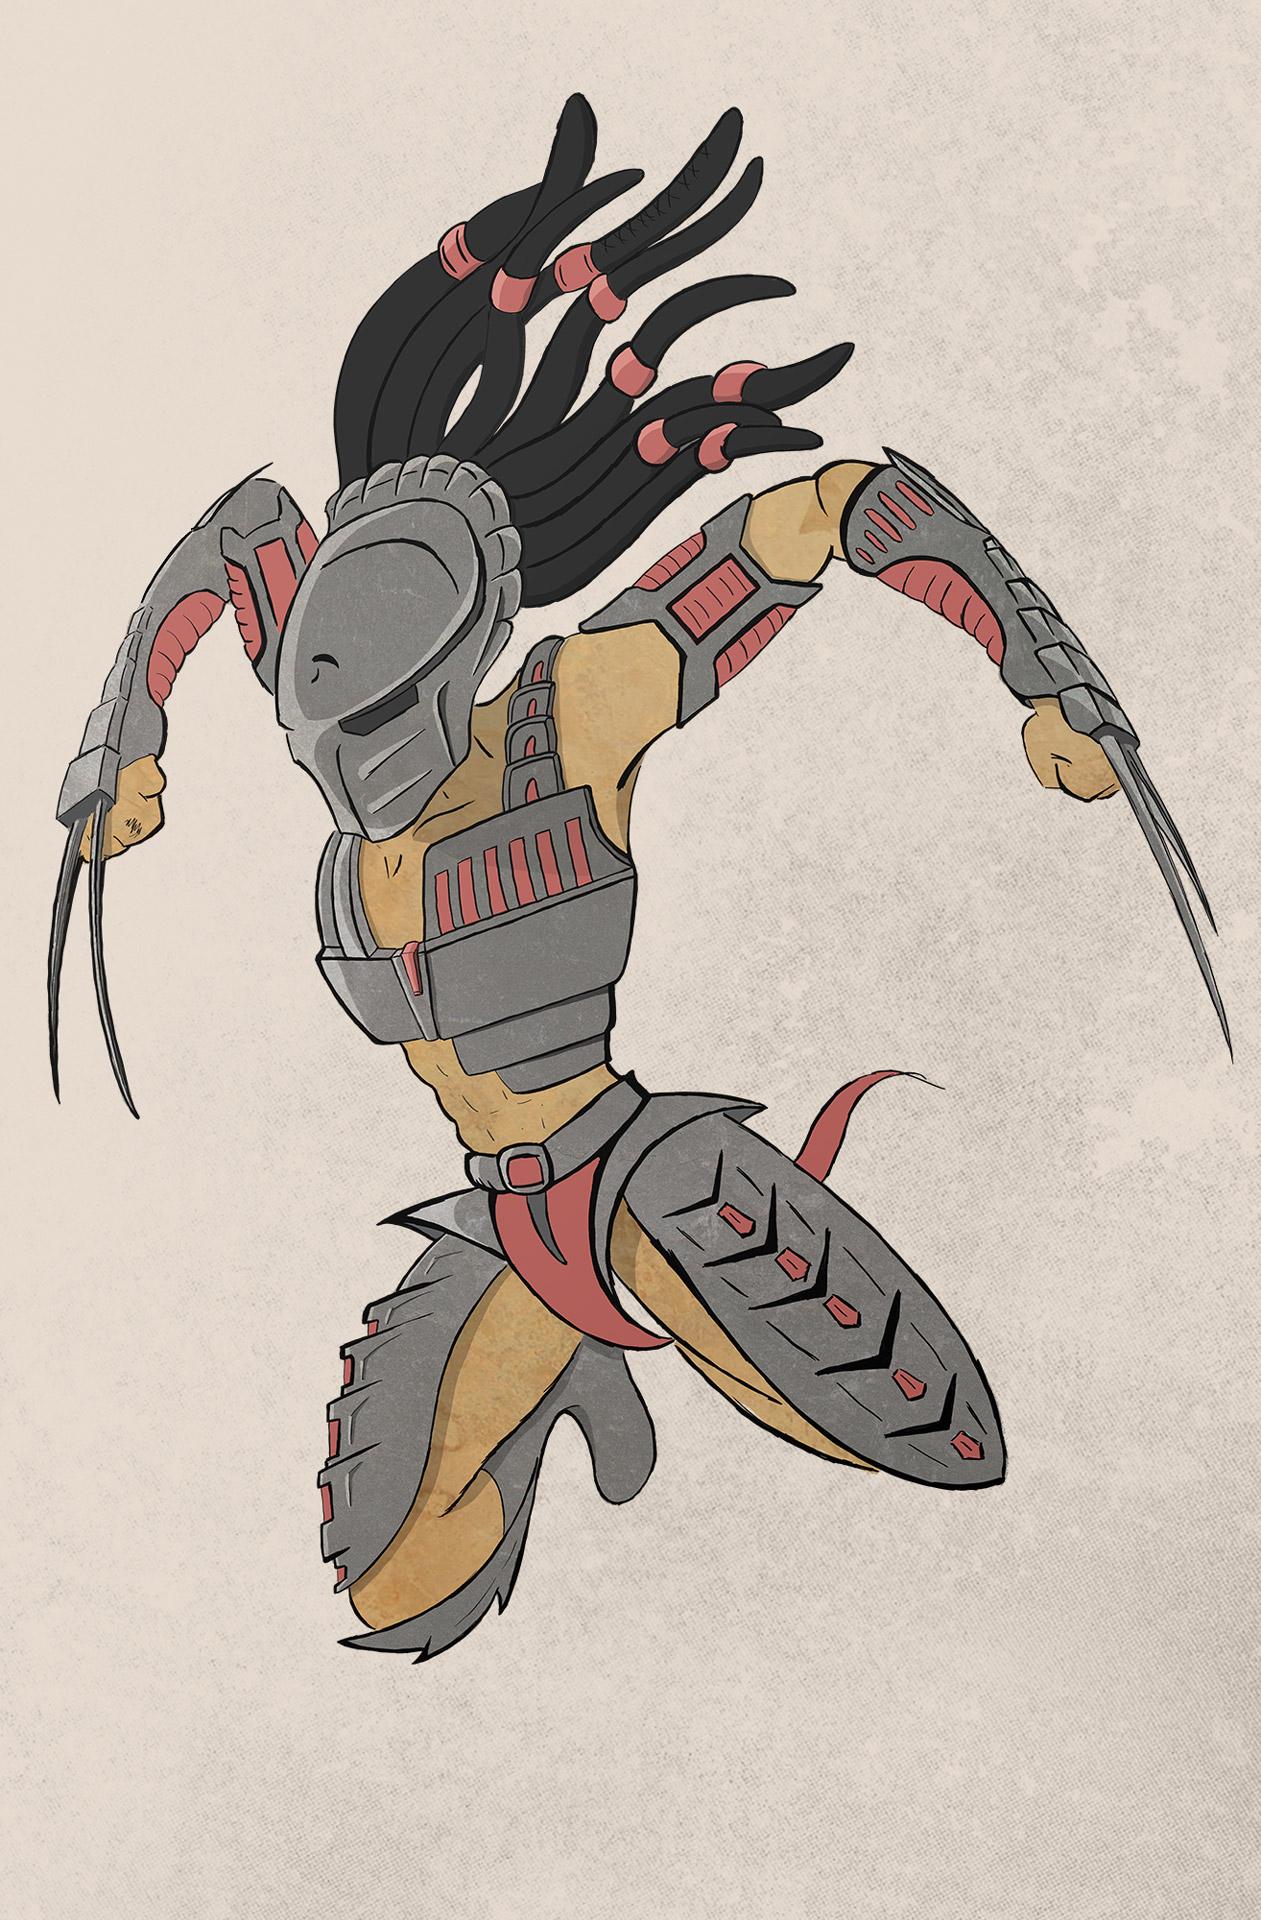 yautja-warrior-illustration-04b.jpg